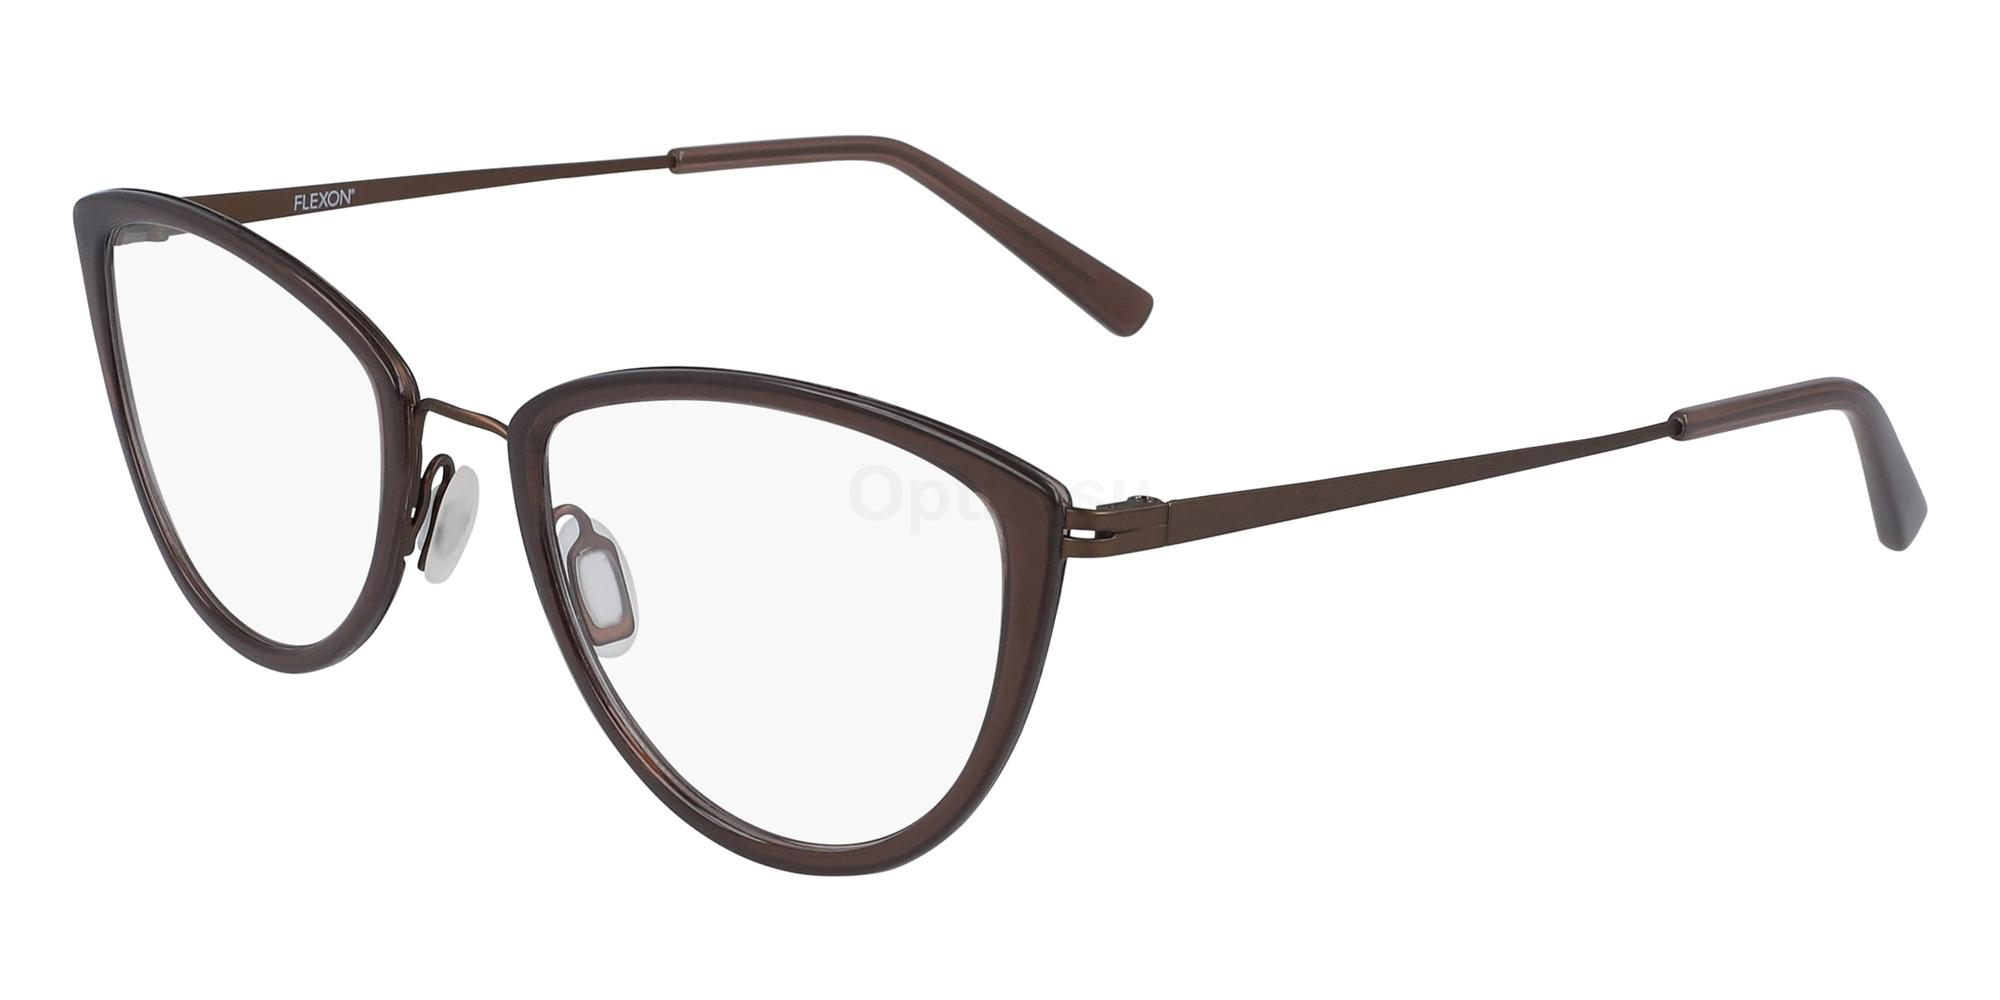 210 FLEXON W3020 Glasses, Flexon